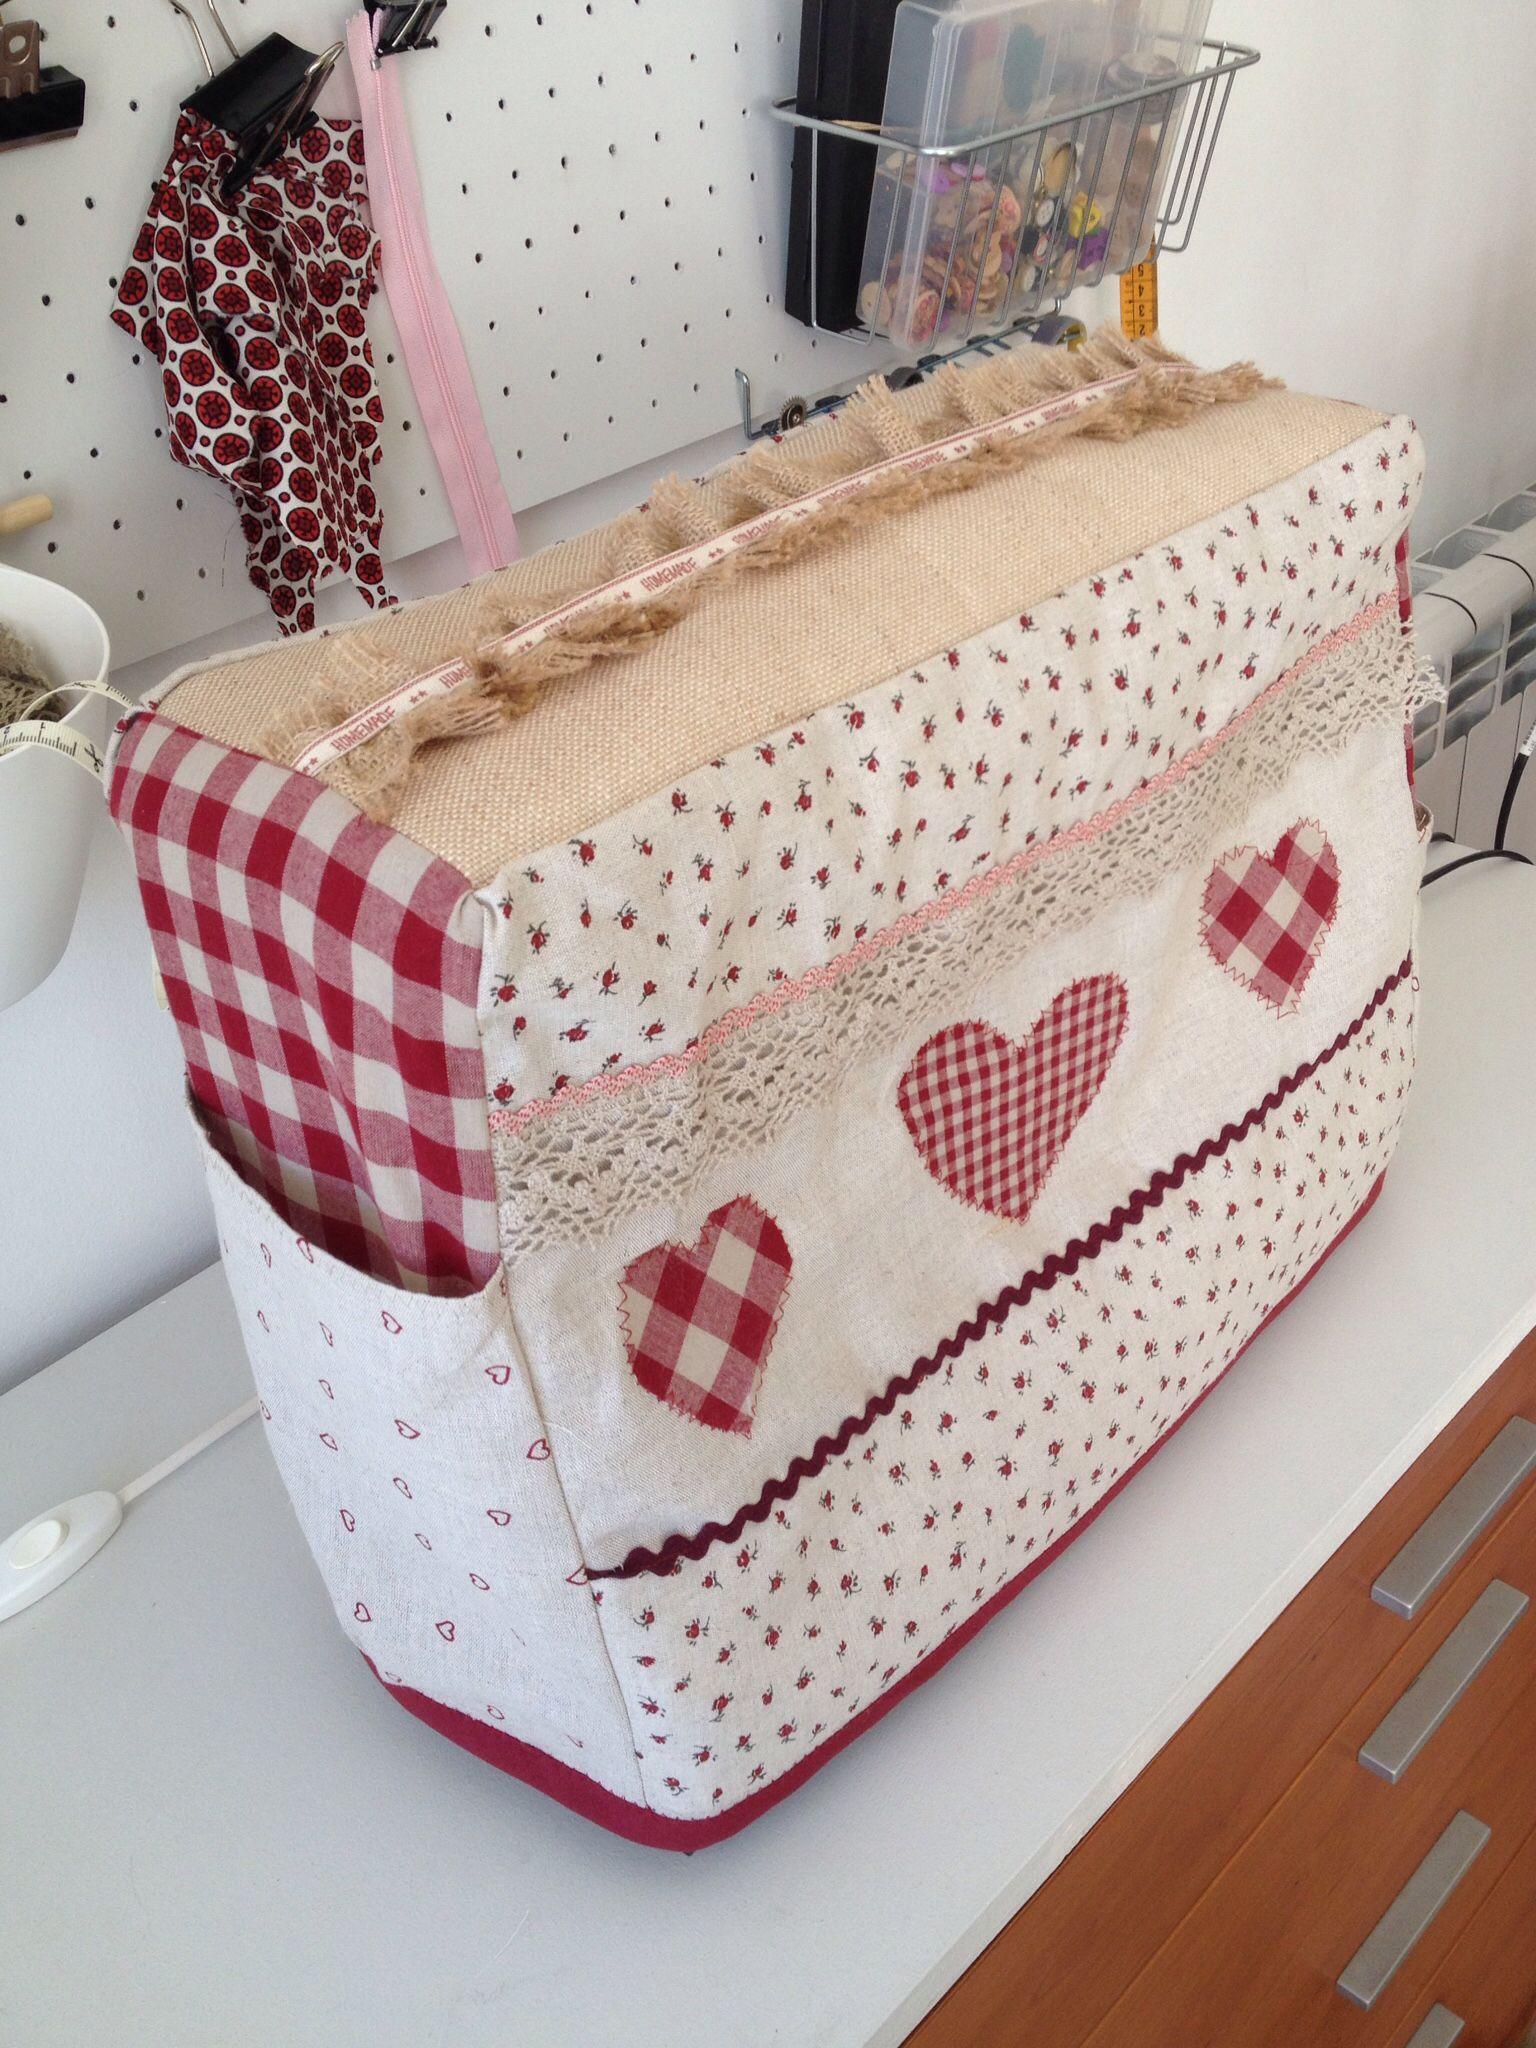 Funda maquina de coser | Cubiertas para máquina de coser